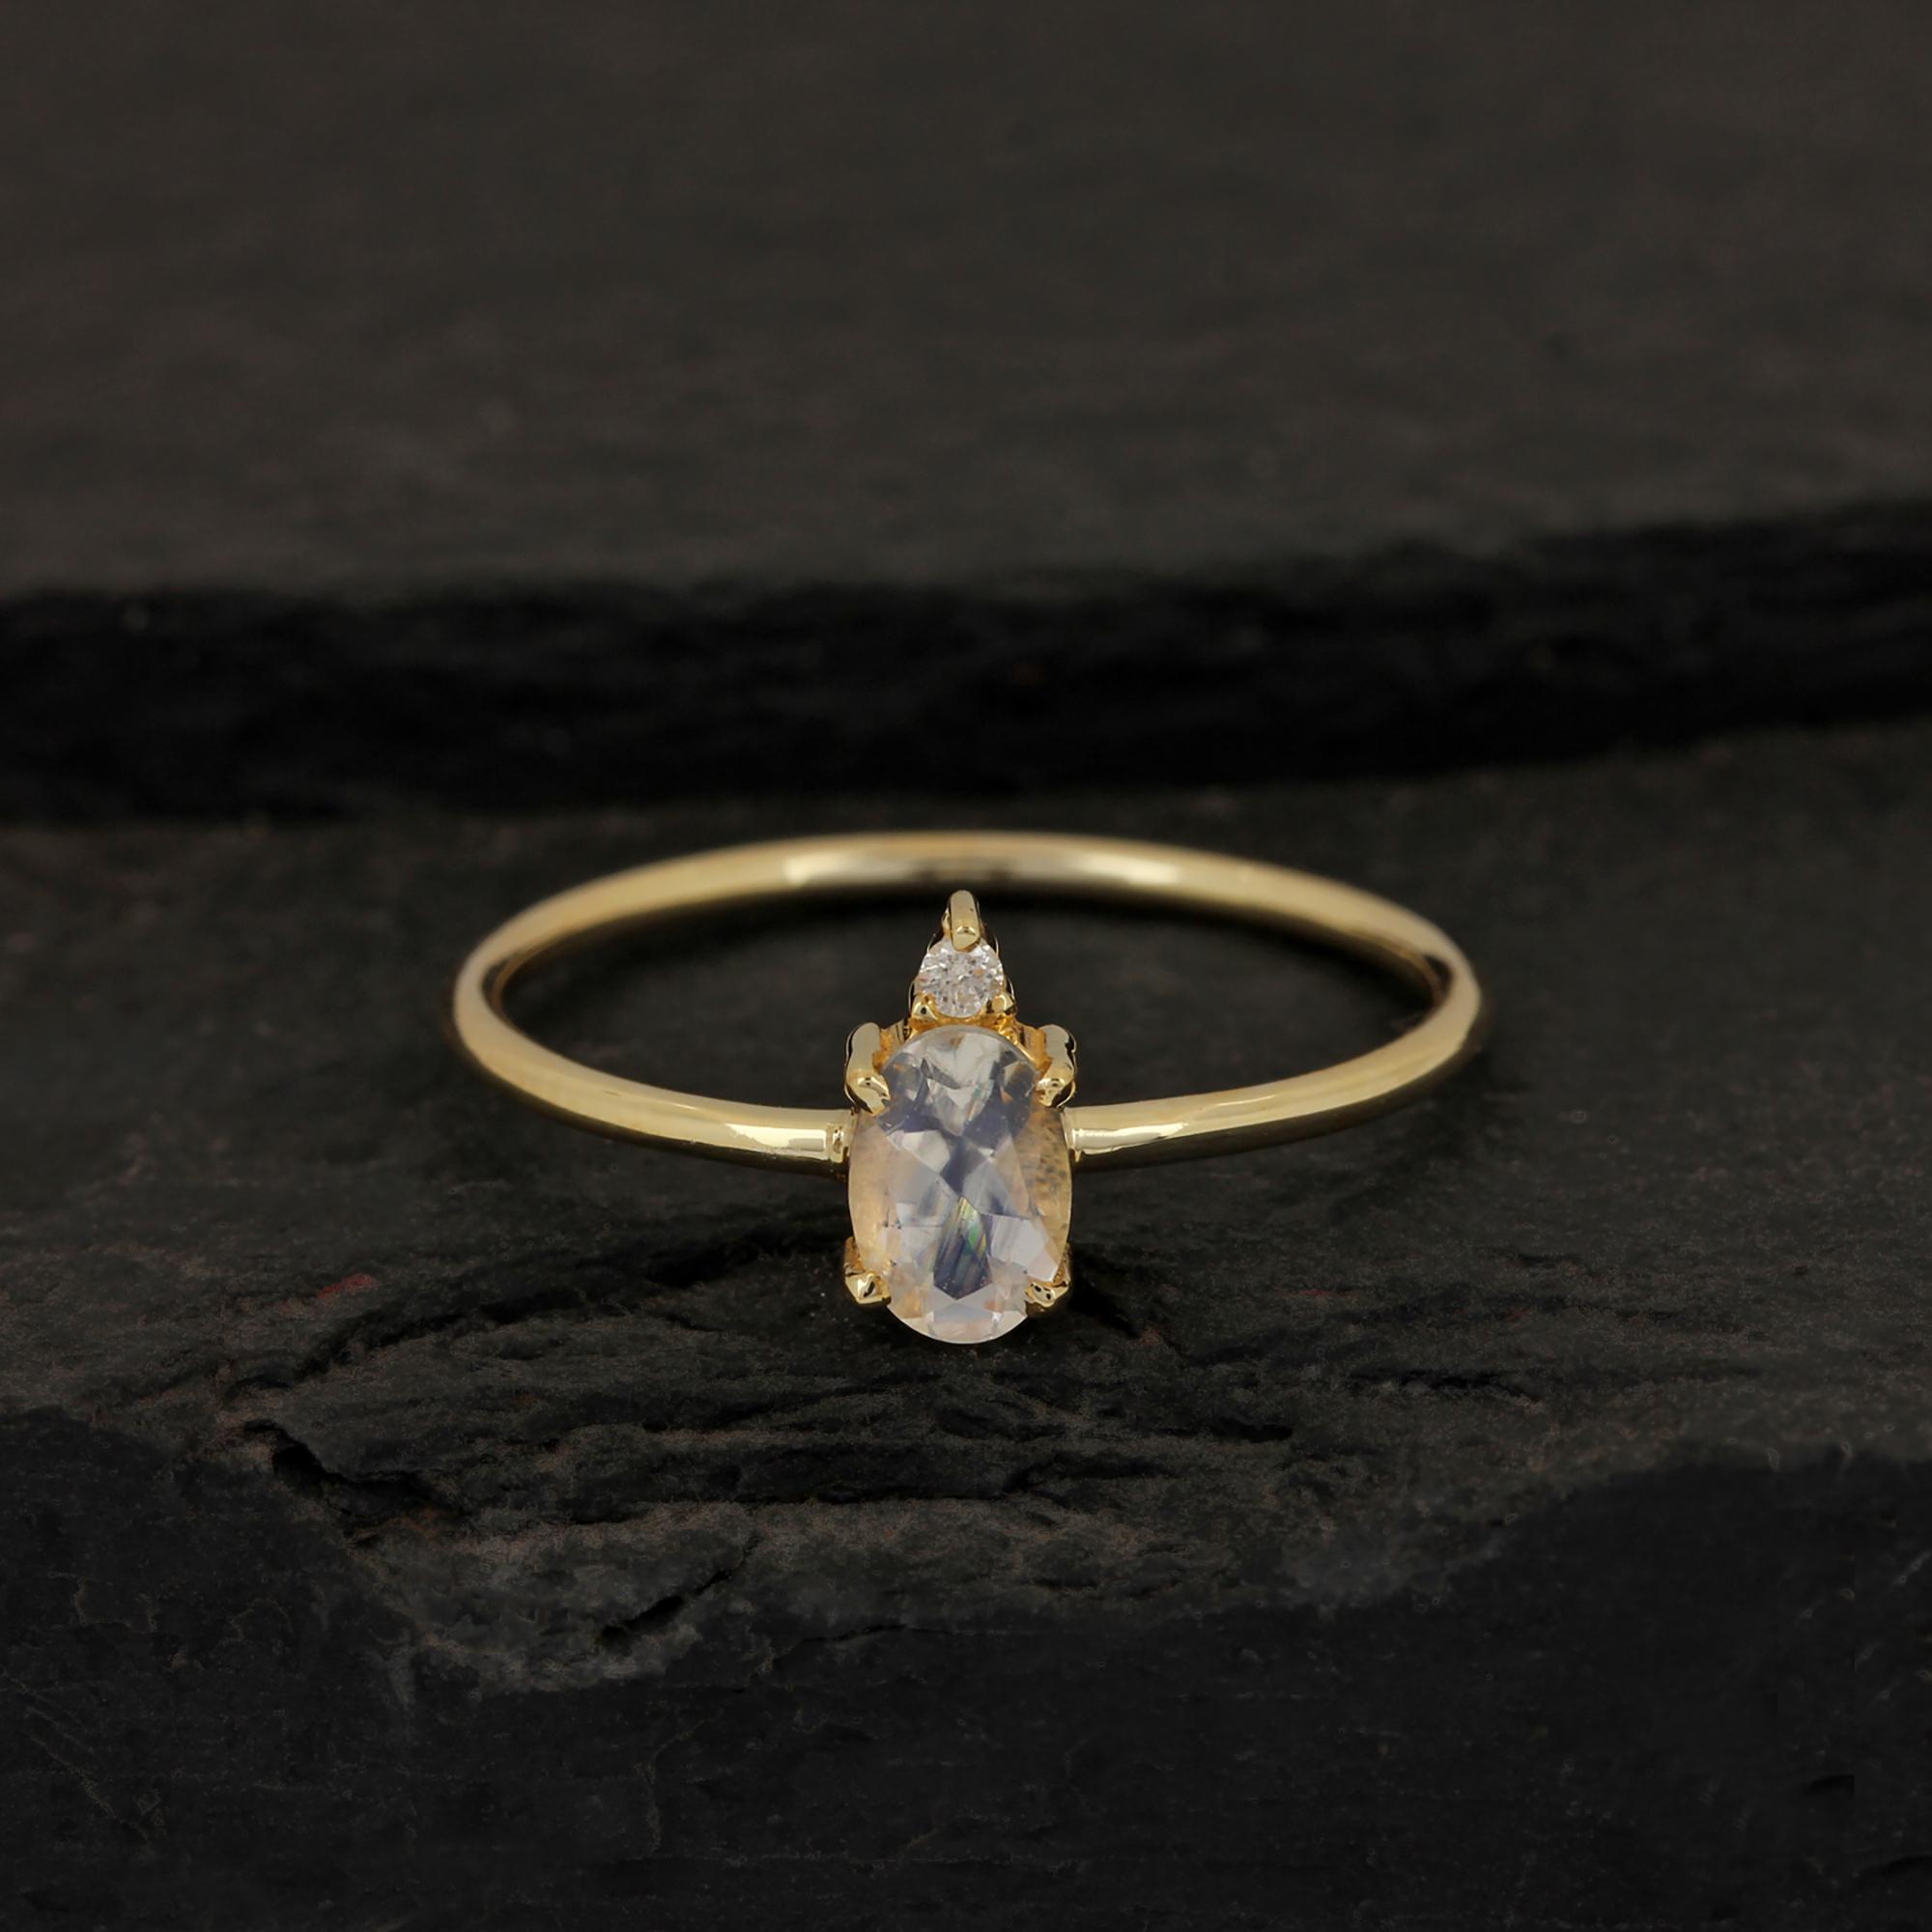 Rainbow Moonstone Ring 14k Gold Diamond Jewelry